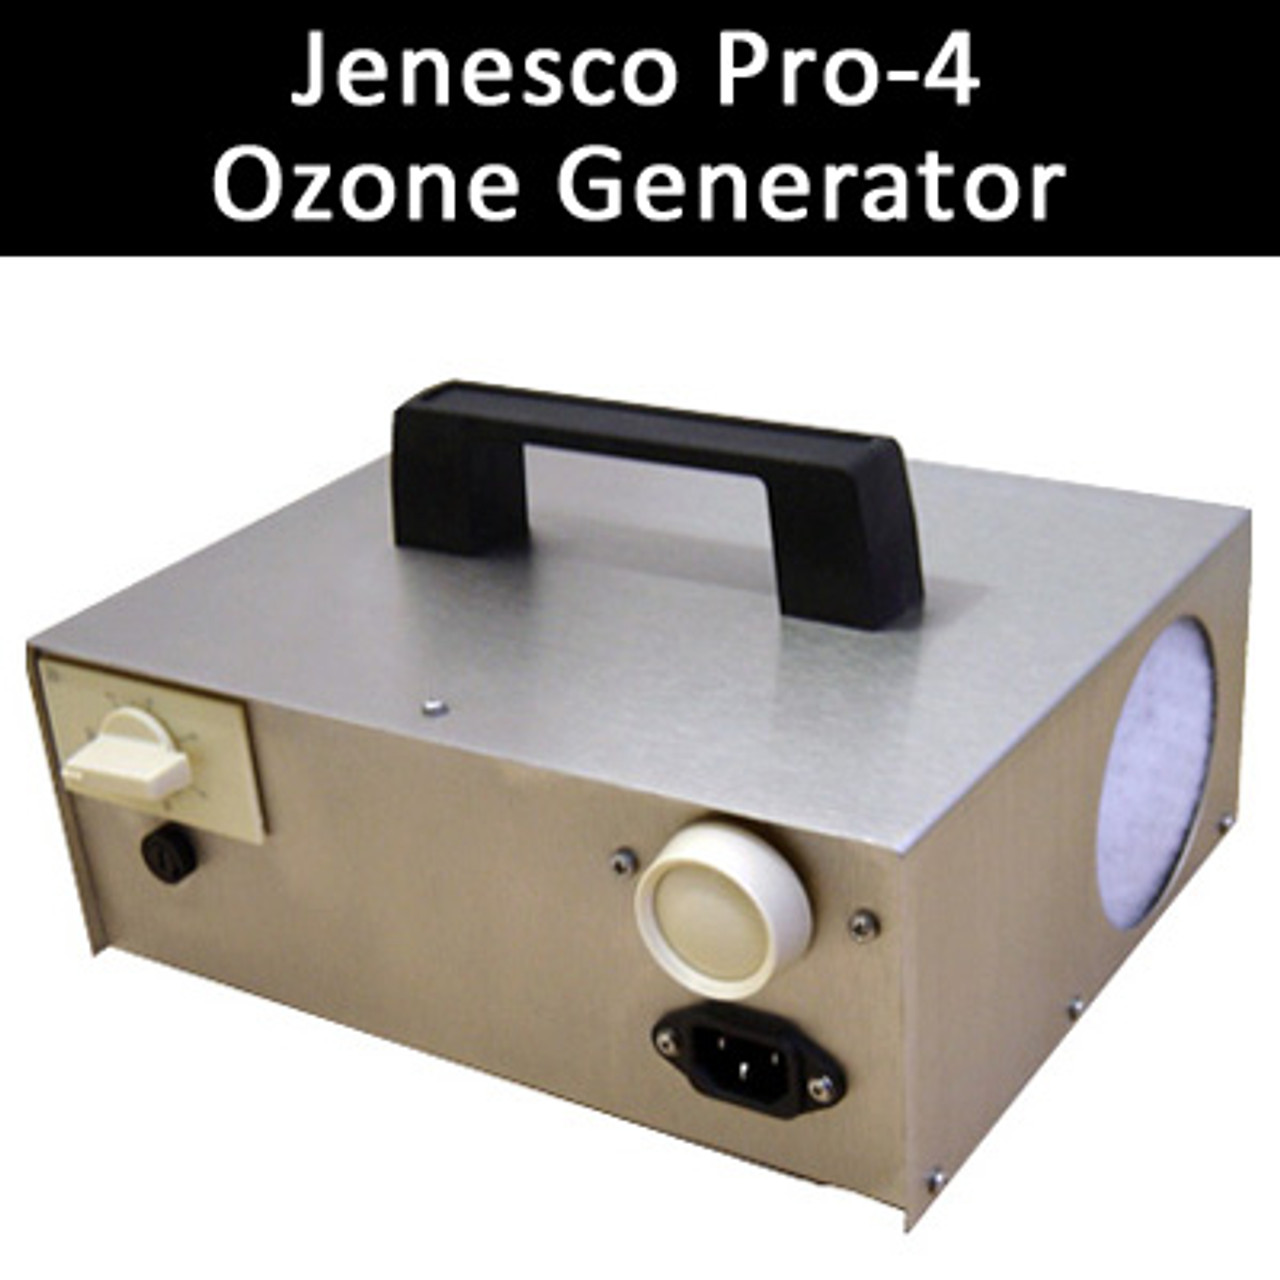 Jenesco PRO-4 High Output Ozone Generator